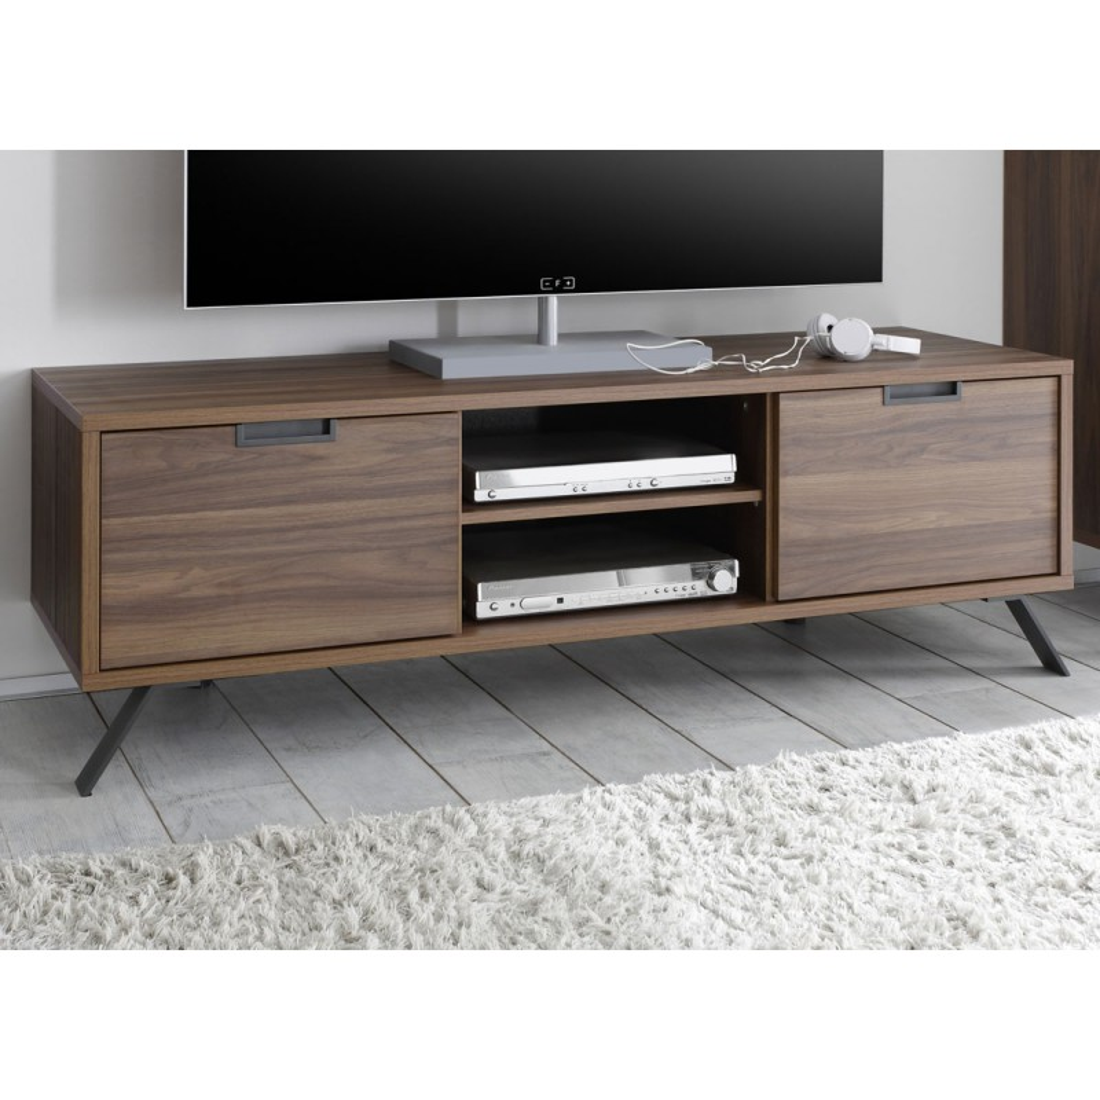 Meuble tv 2 portes noyer moderne palerme univers du salon for Meuble tv 2 portes